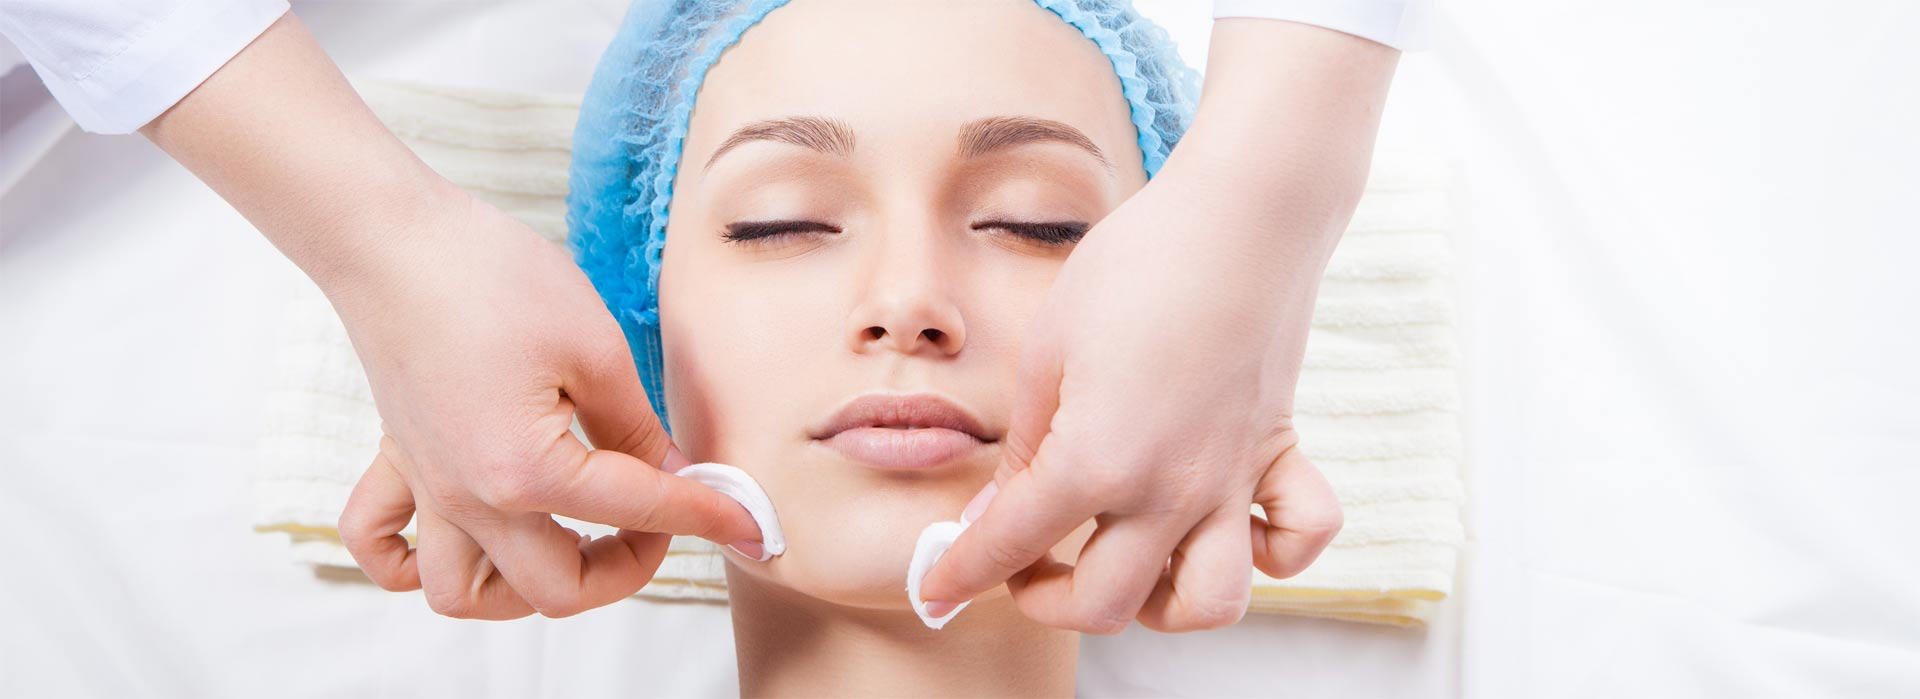 Чистка, уход за кожей лица, пилинг, карбокситерапия от 20 руб.